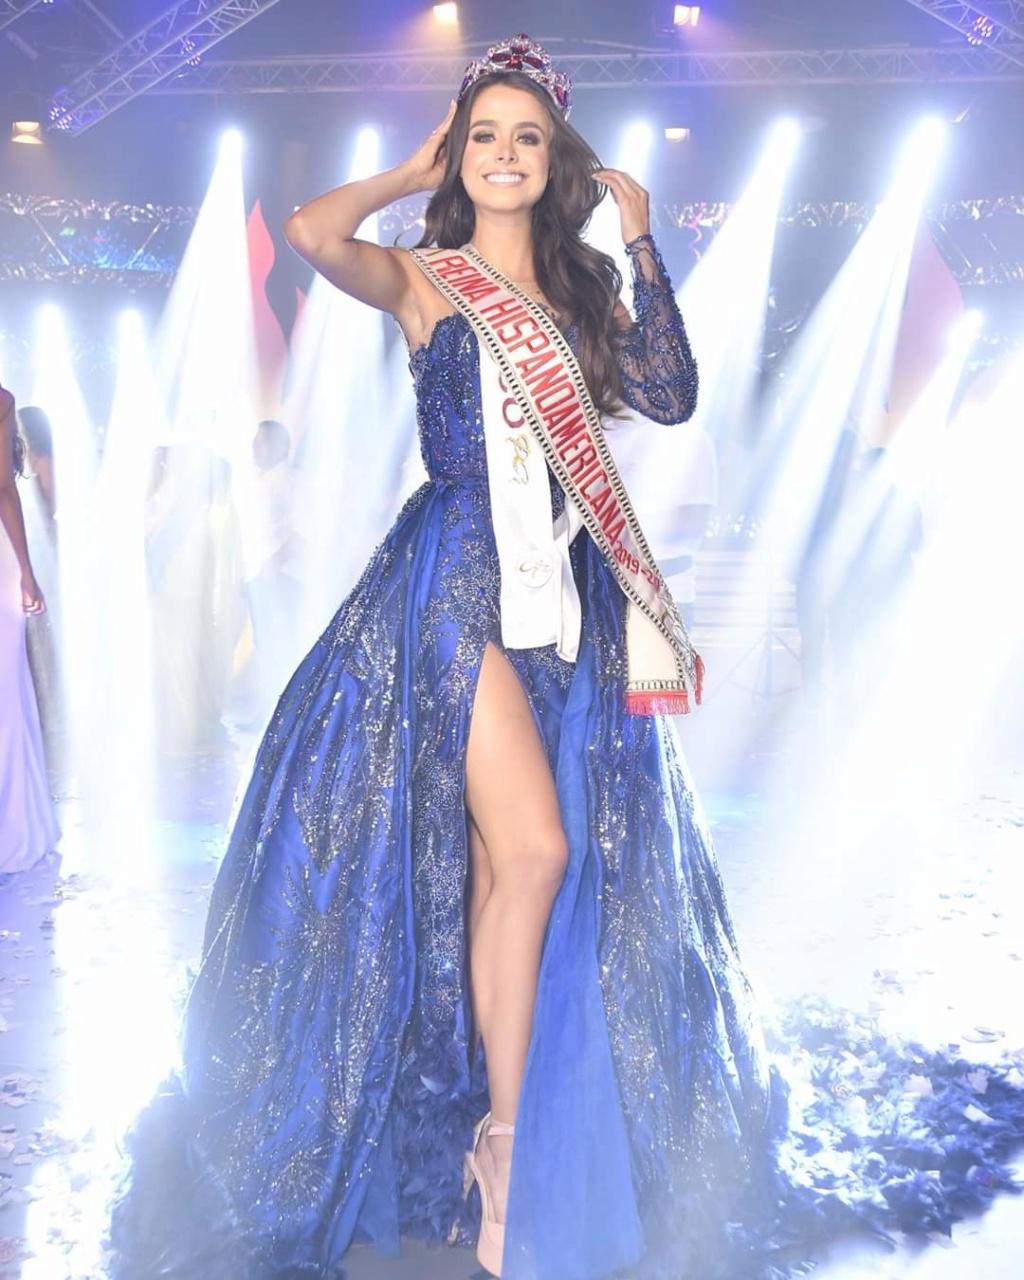 Reina Hispanoamericana 2019/2020 - Page 2 Fb_14997